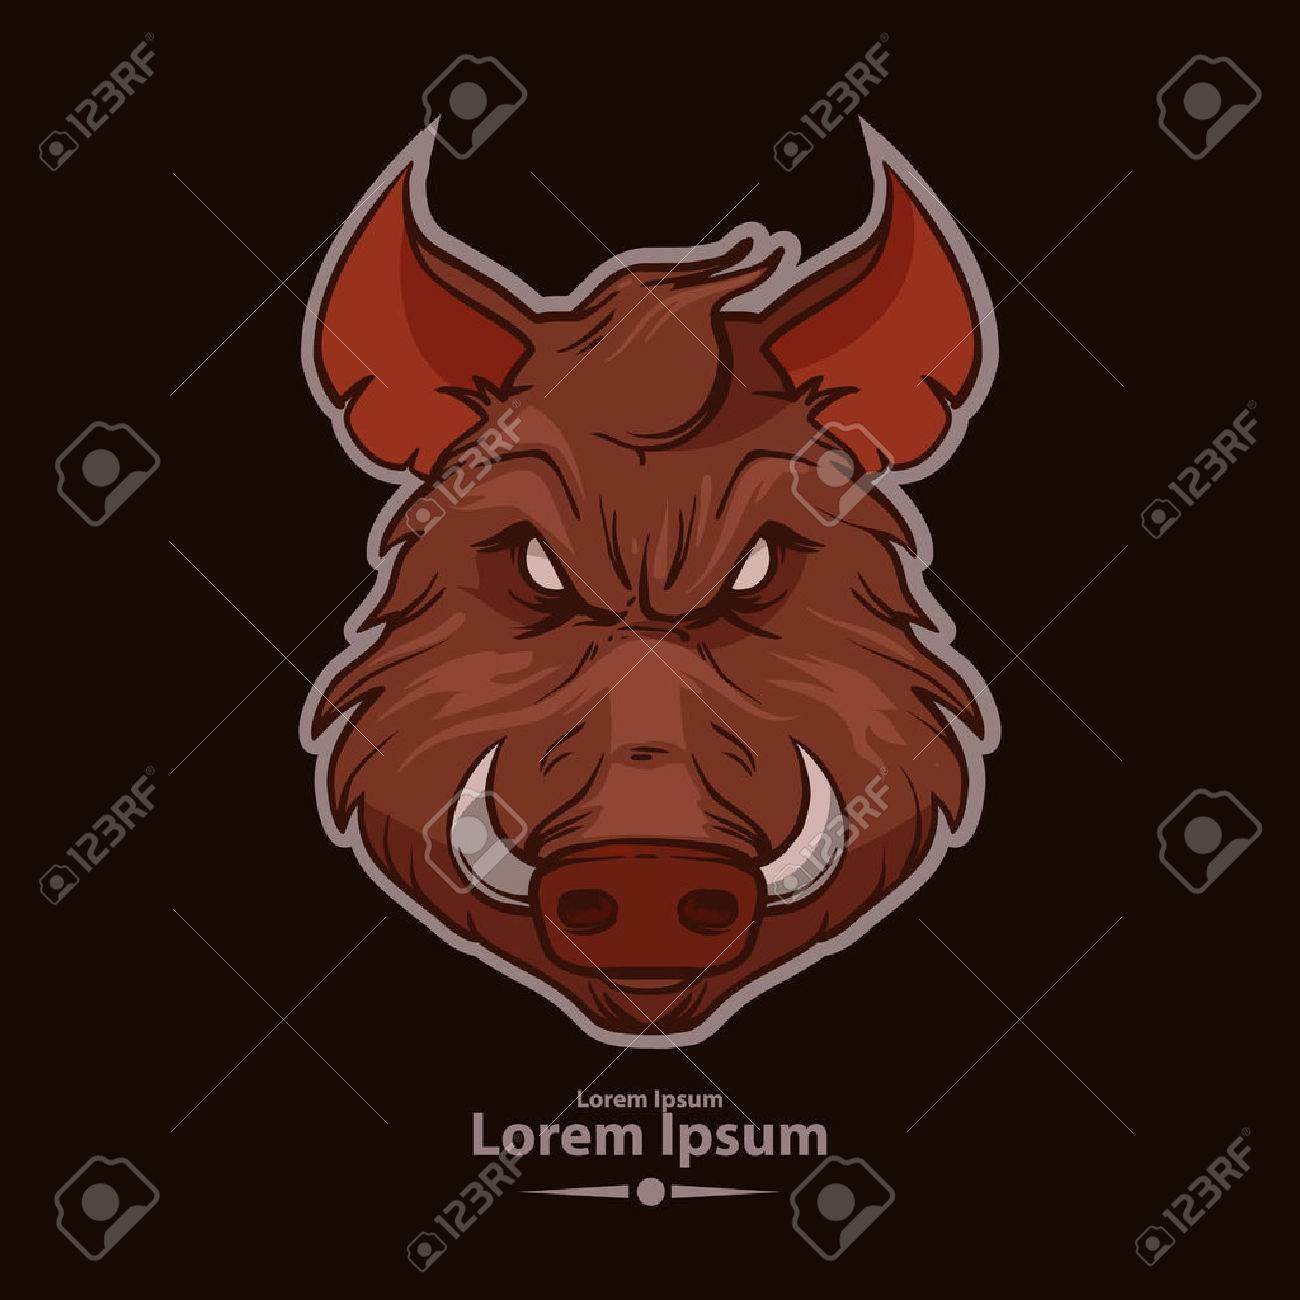 Boar For Logo American Football Symbol Simple Illustration